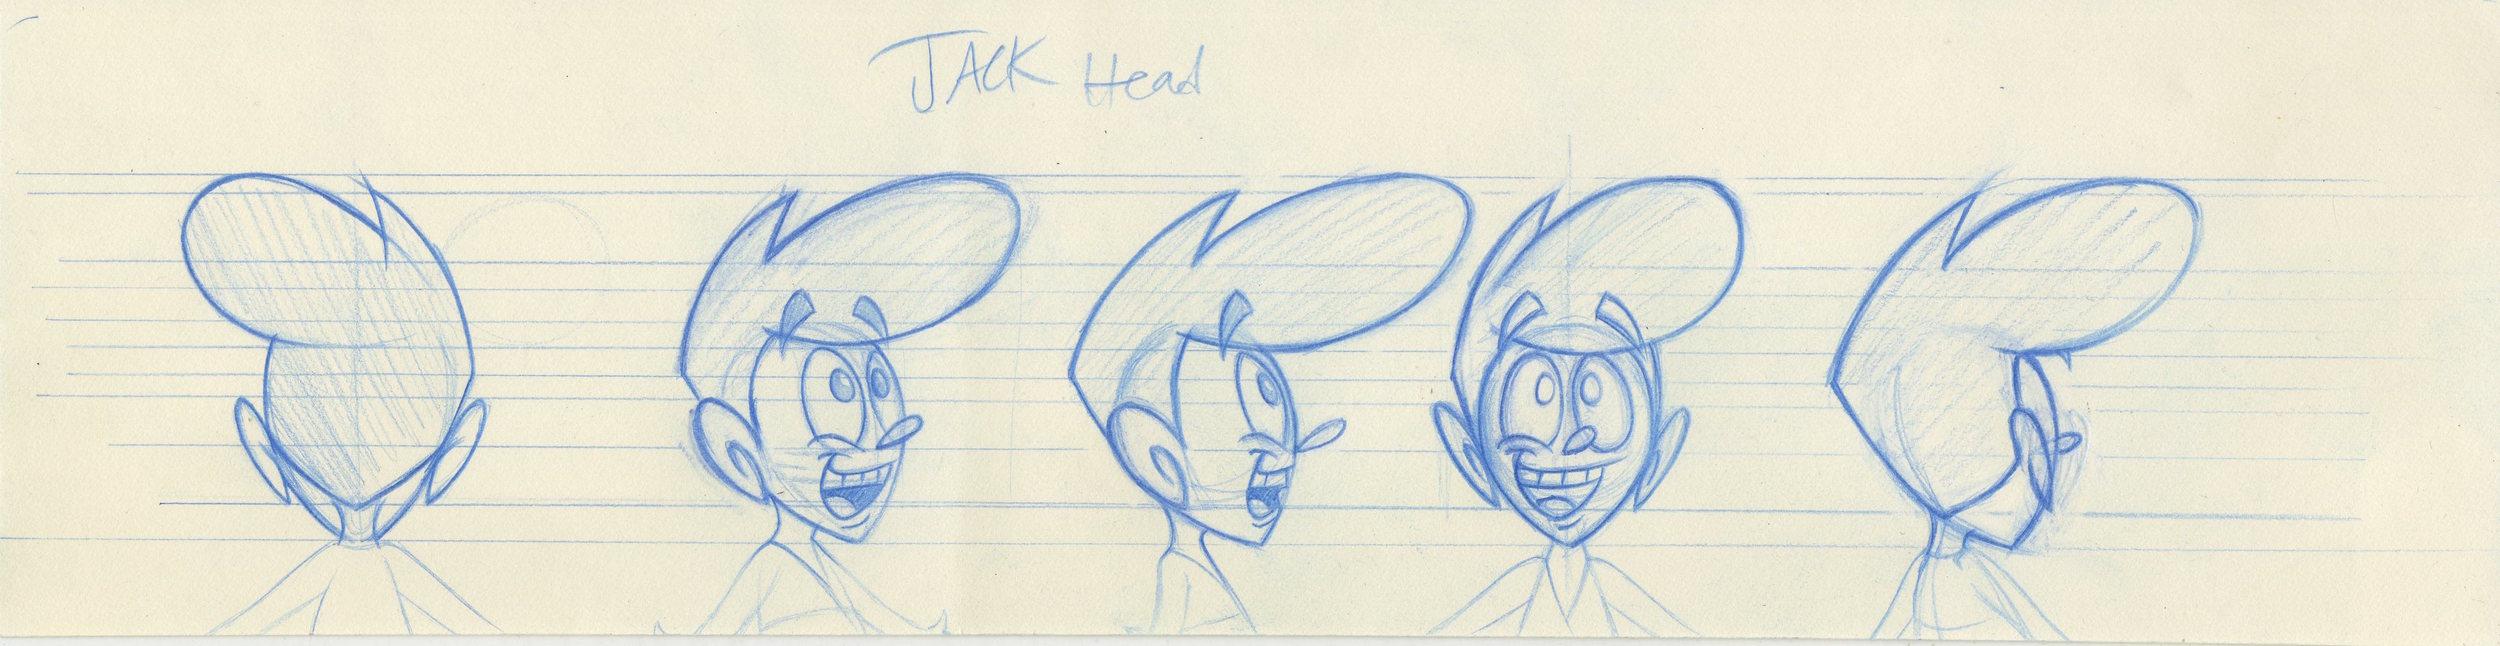 jj_jack_head.jpg